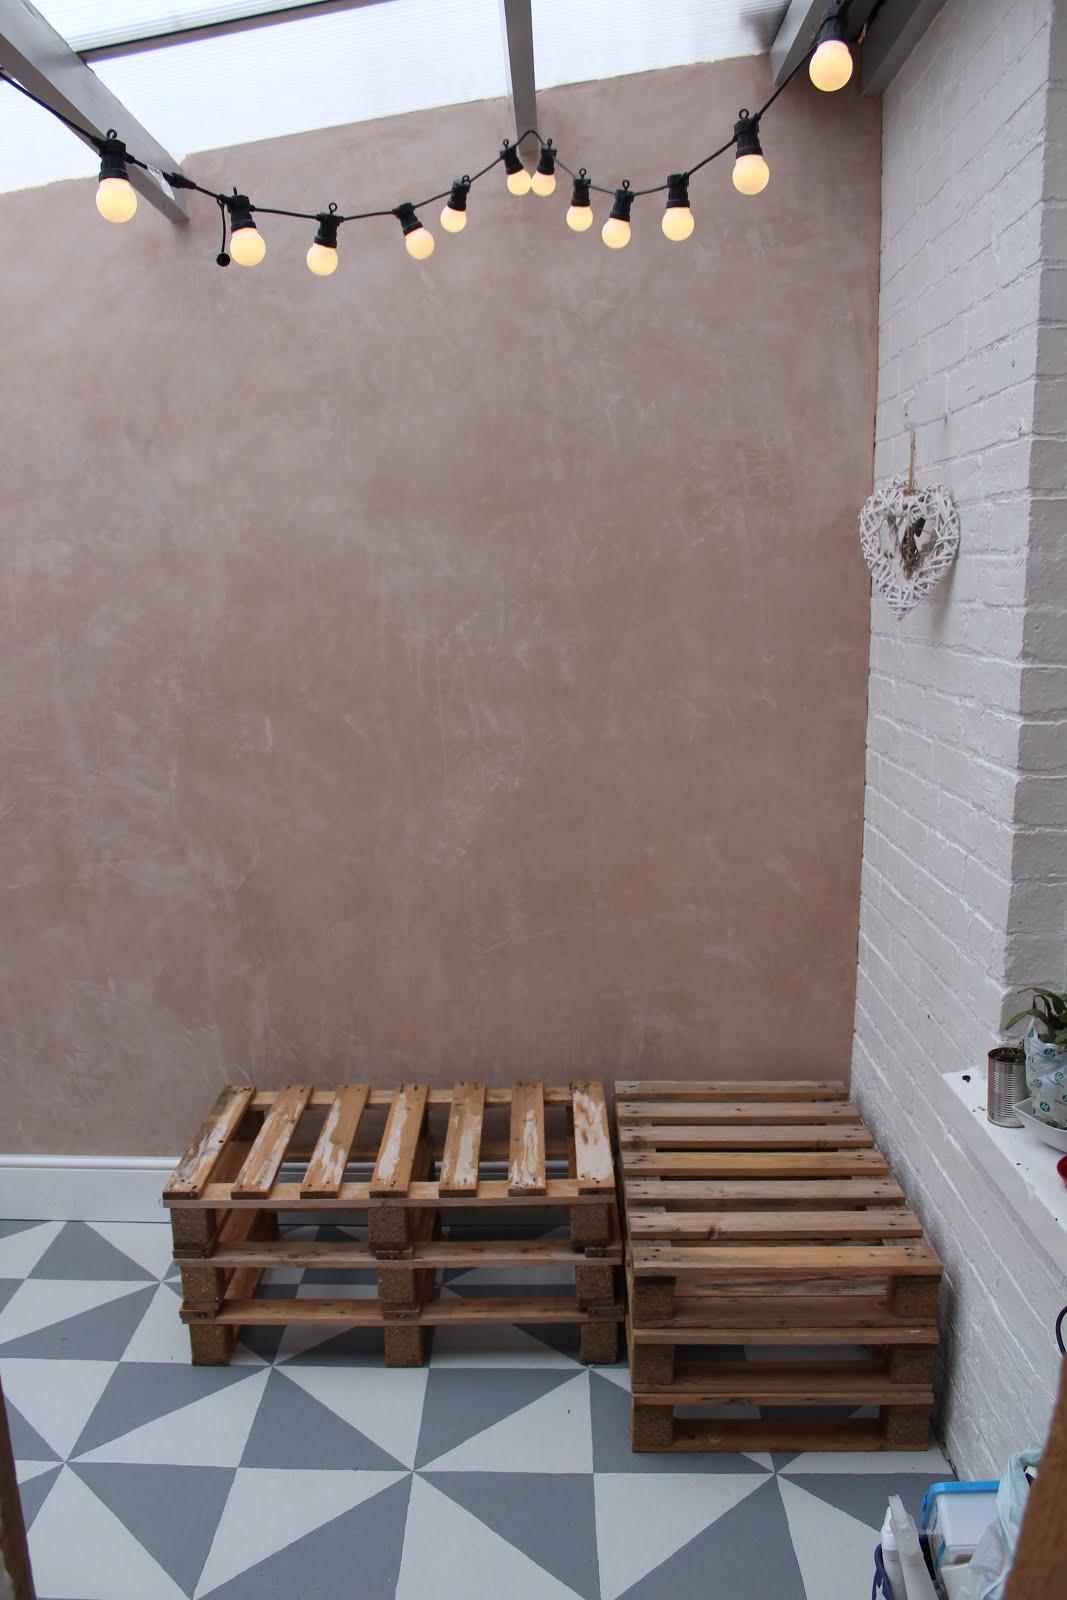 Colour Matching With Valspar Paint Kezzabeth Diy Renovation Blog